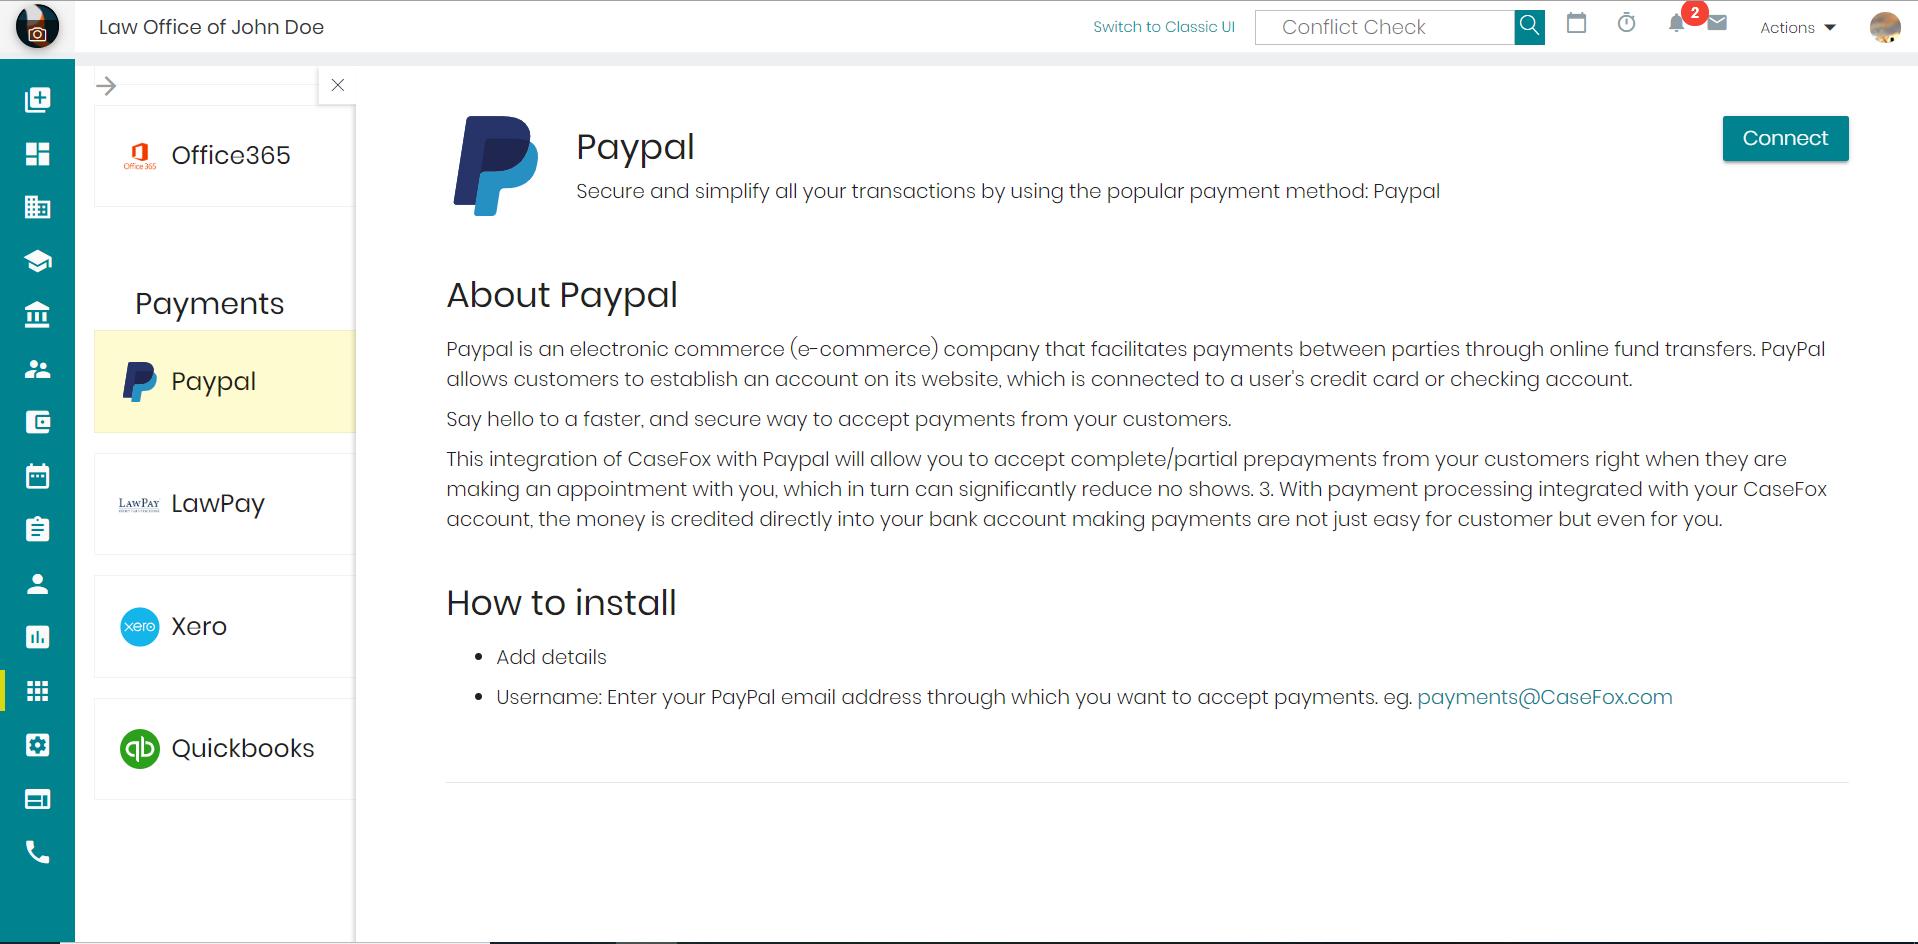 Paypal-casefox